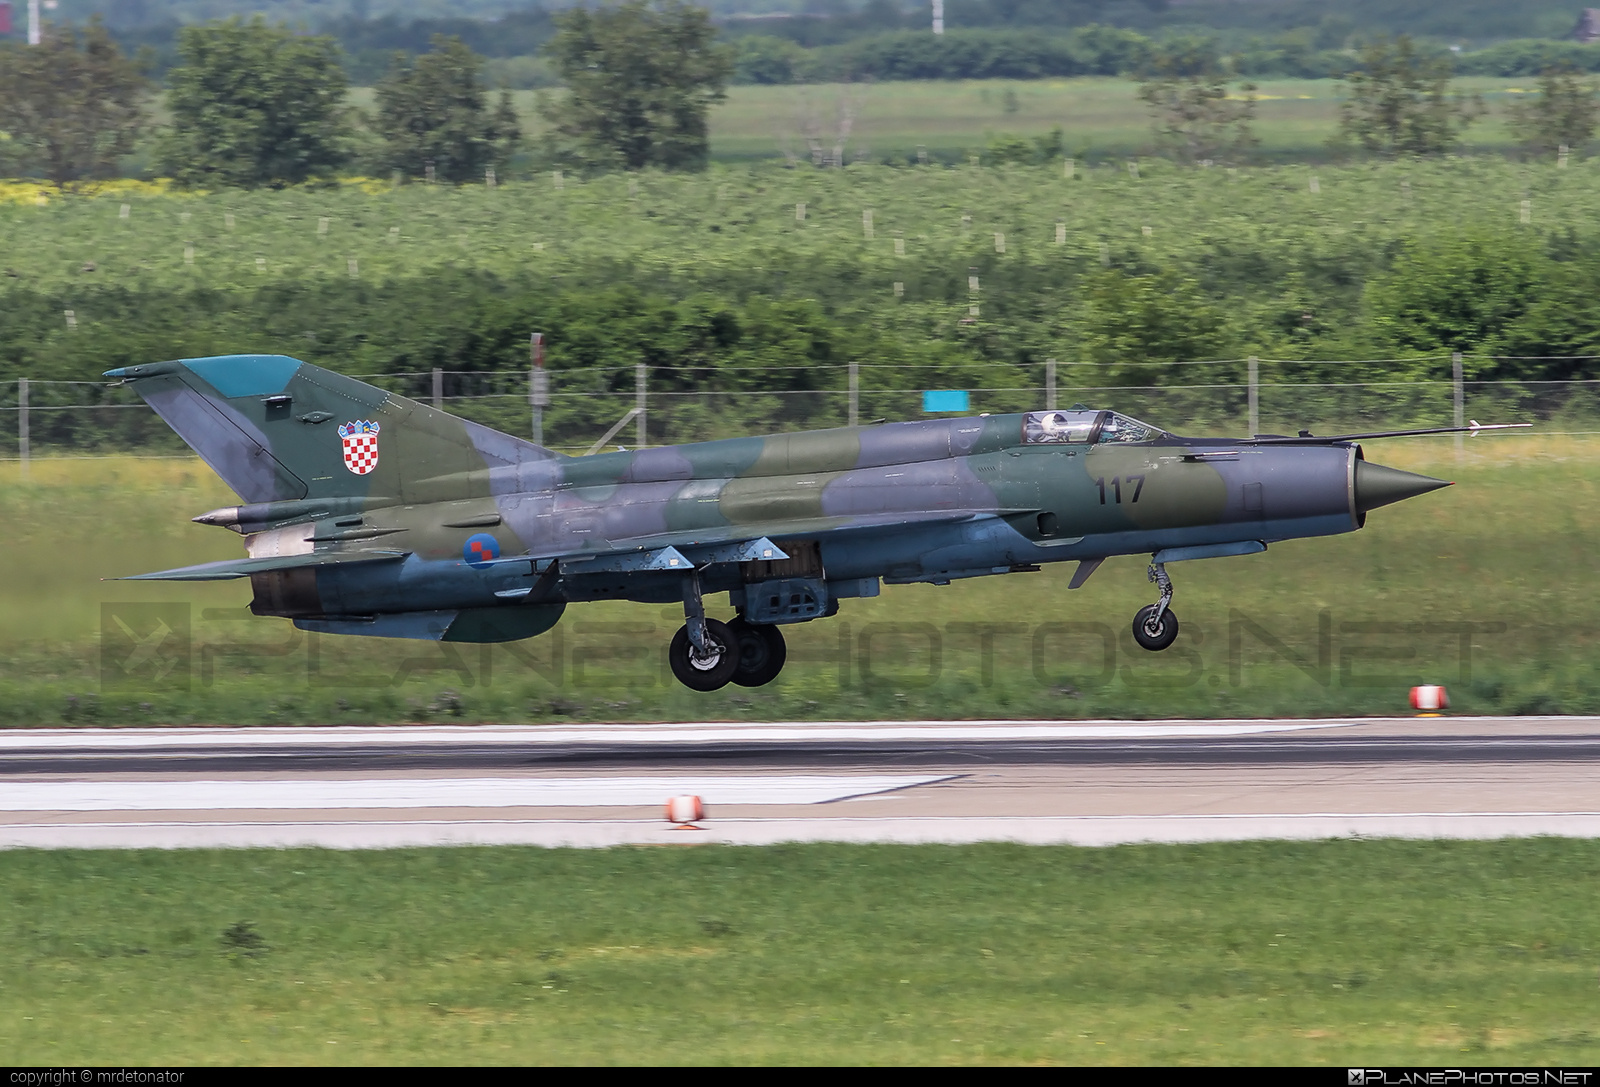 Mikoyan-Gurevich MiG-21bis-D - 117 operated by Hrvatsko ratno zrakoplovstvo i protuzračna obrana (Croatian Air Force) #mig #mig21 #mig21bisd #mikoyangurevich